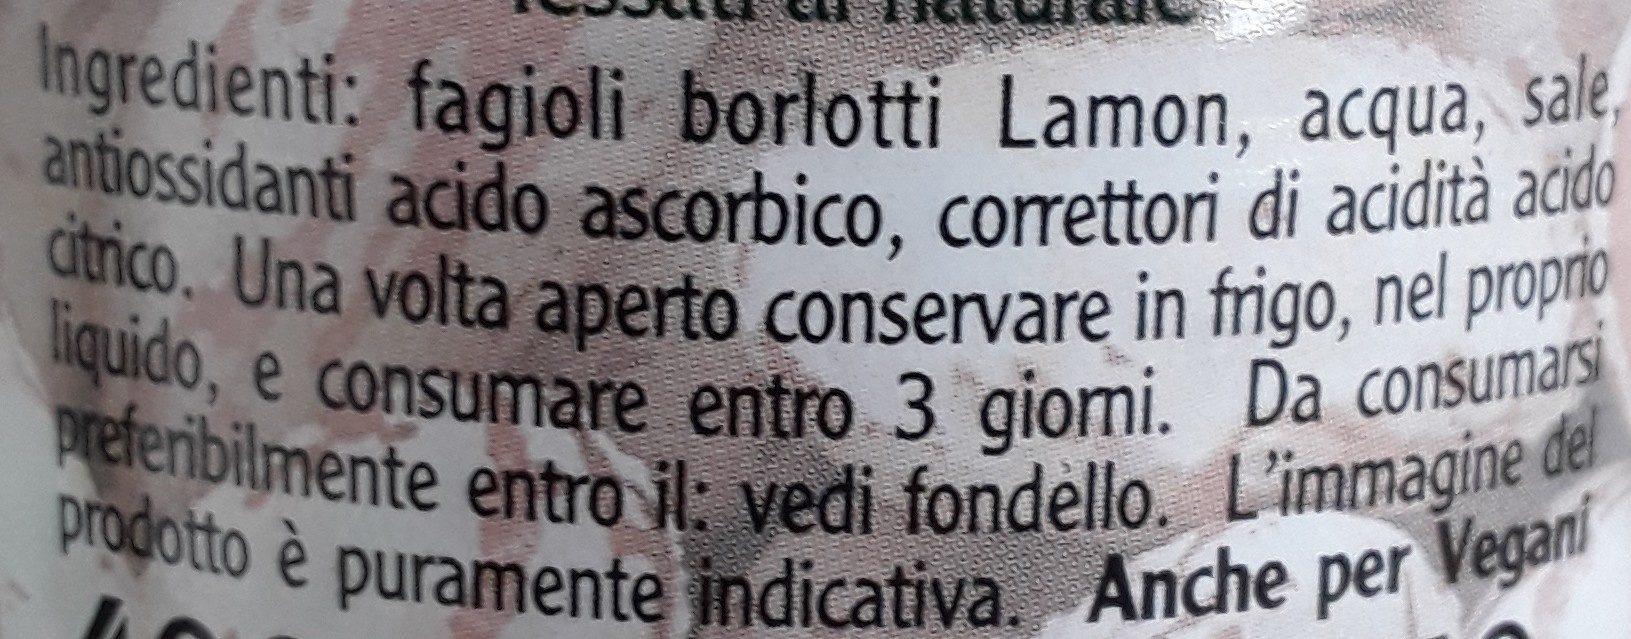 Fagioli Borlotti Lamon - Ingredienti